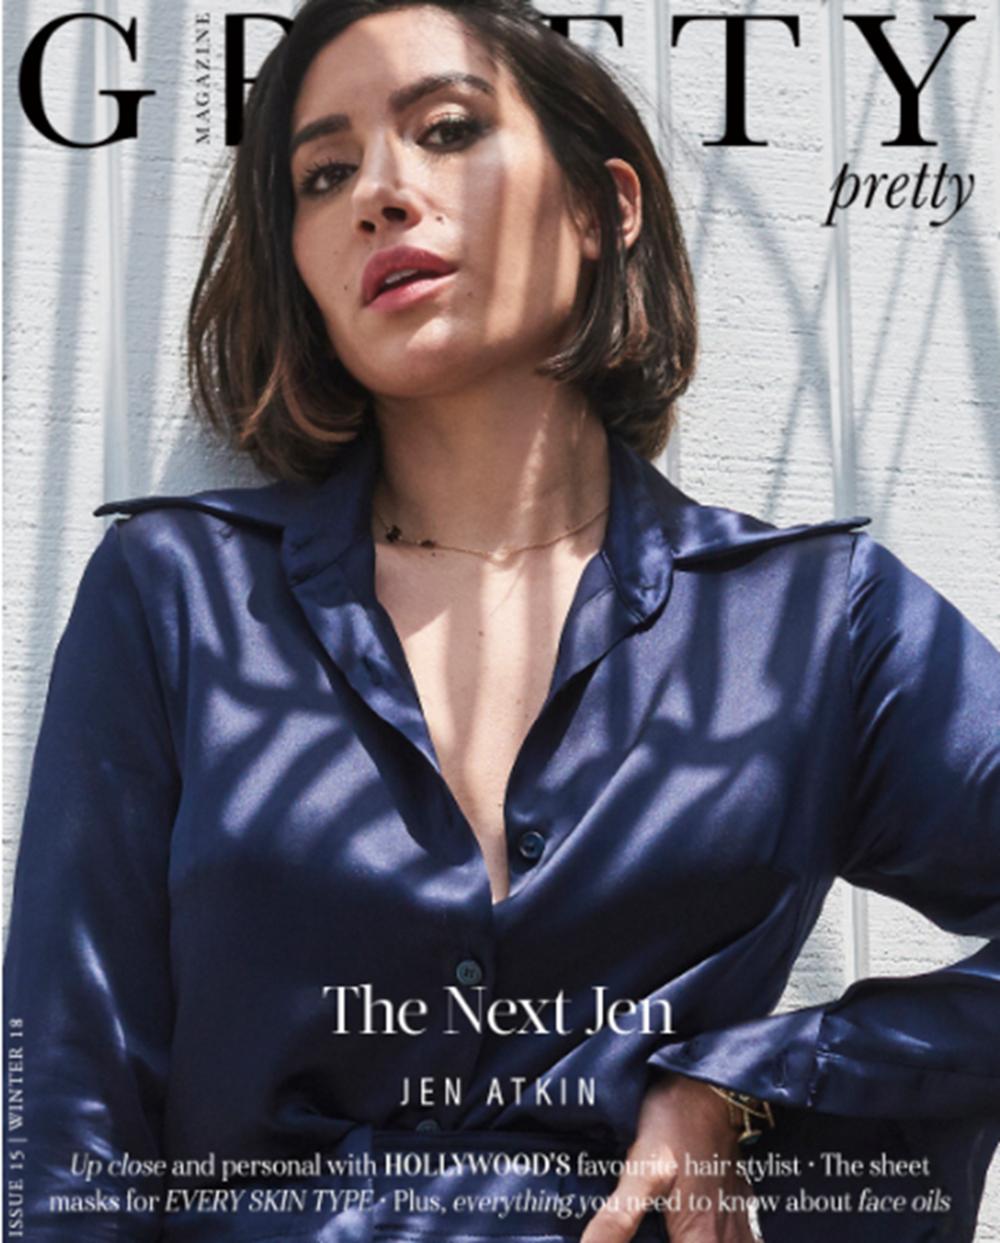 Gritty Pretty Issue 15/Winter 18